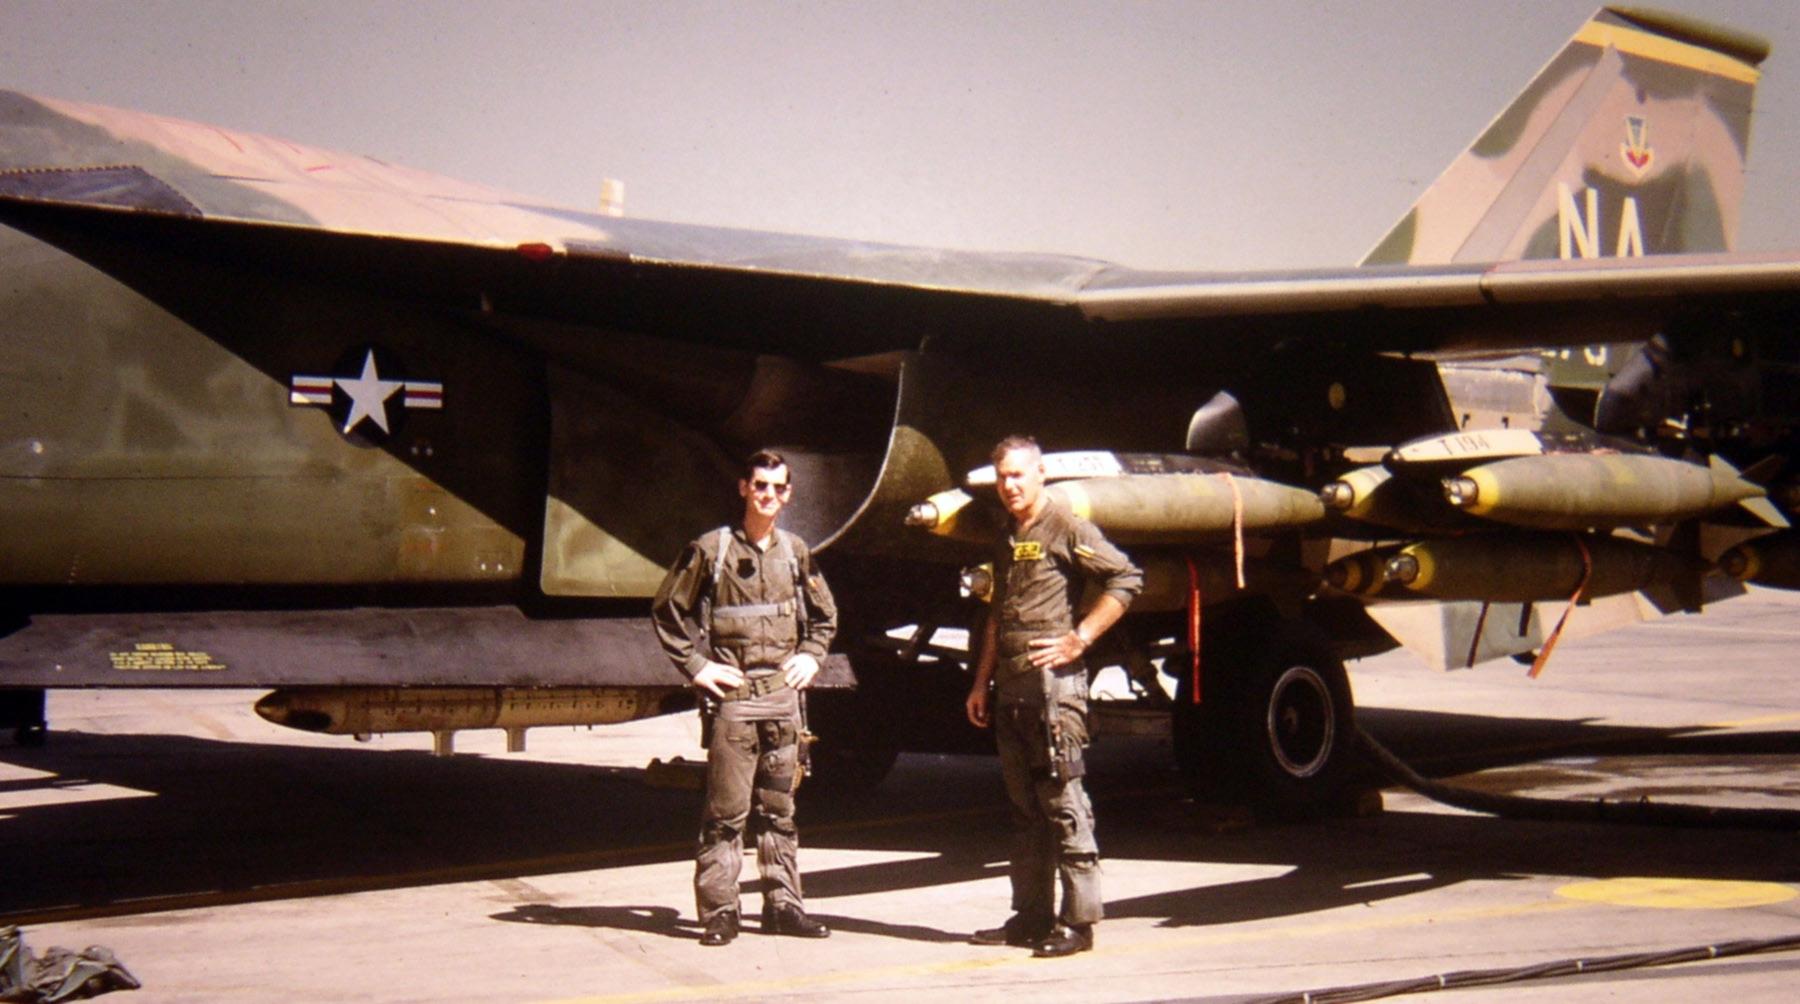 474th_F-111A_crew_at_Takhli_1972.jpg